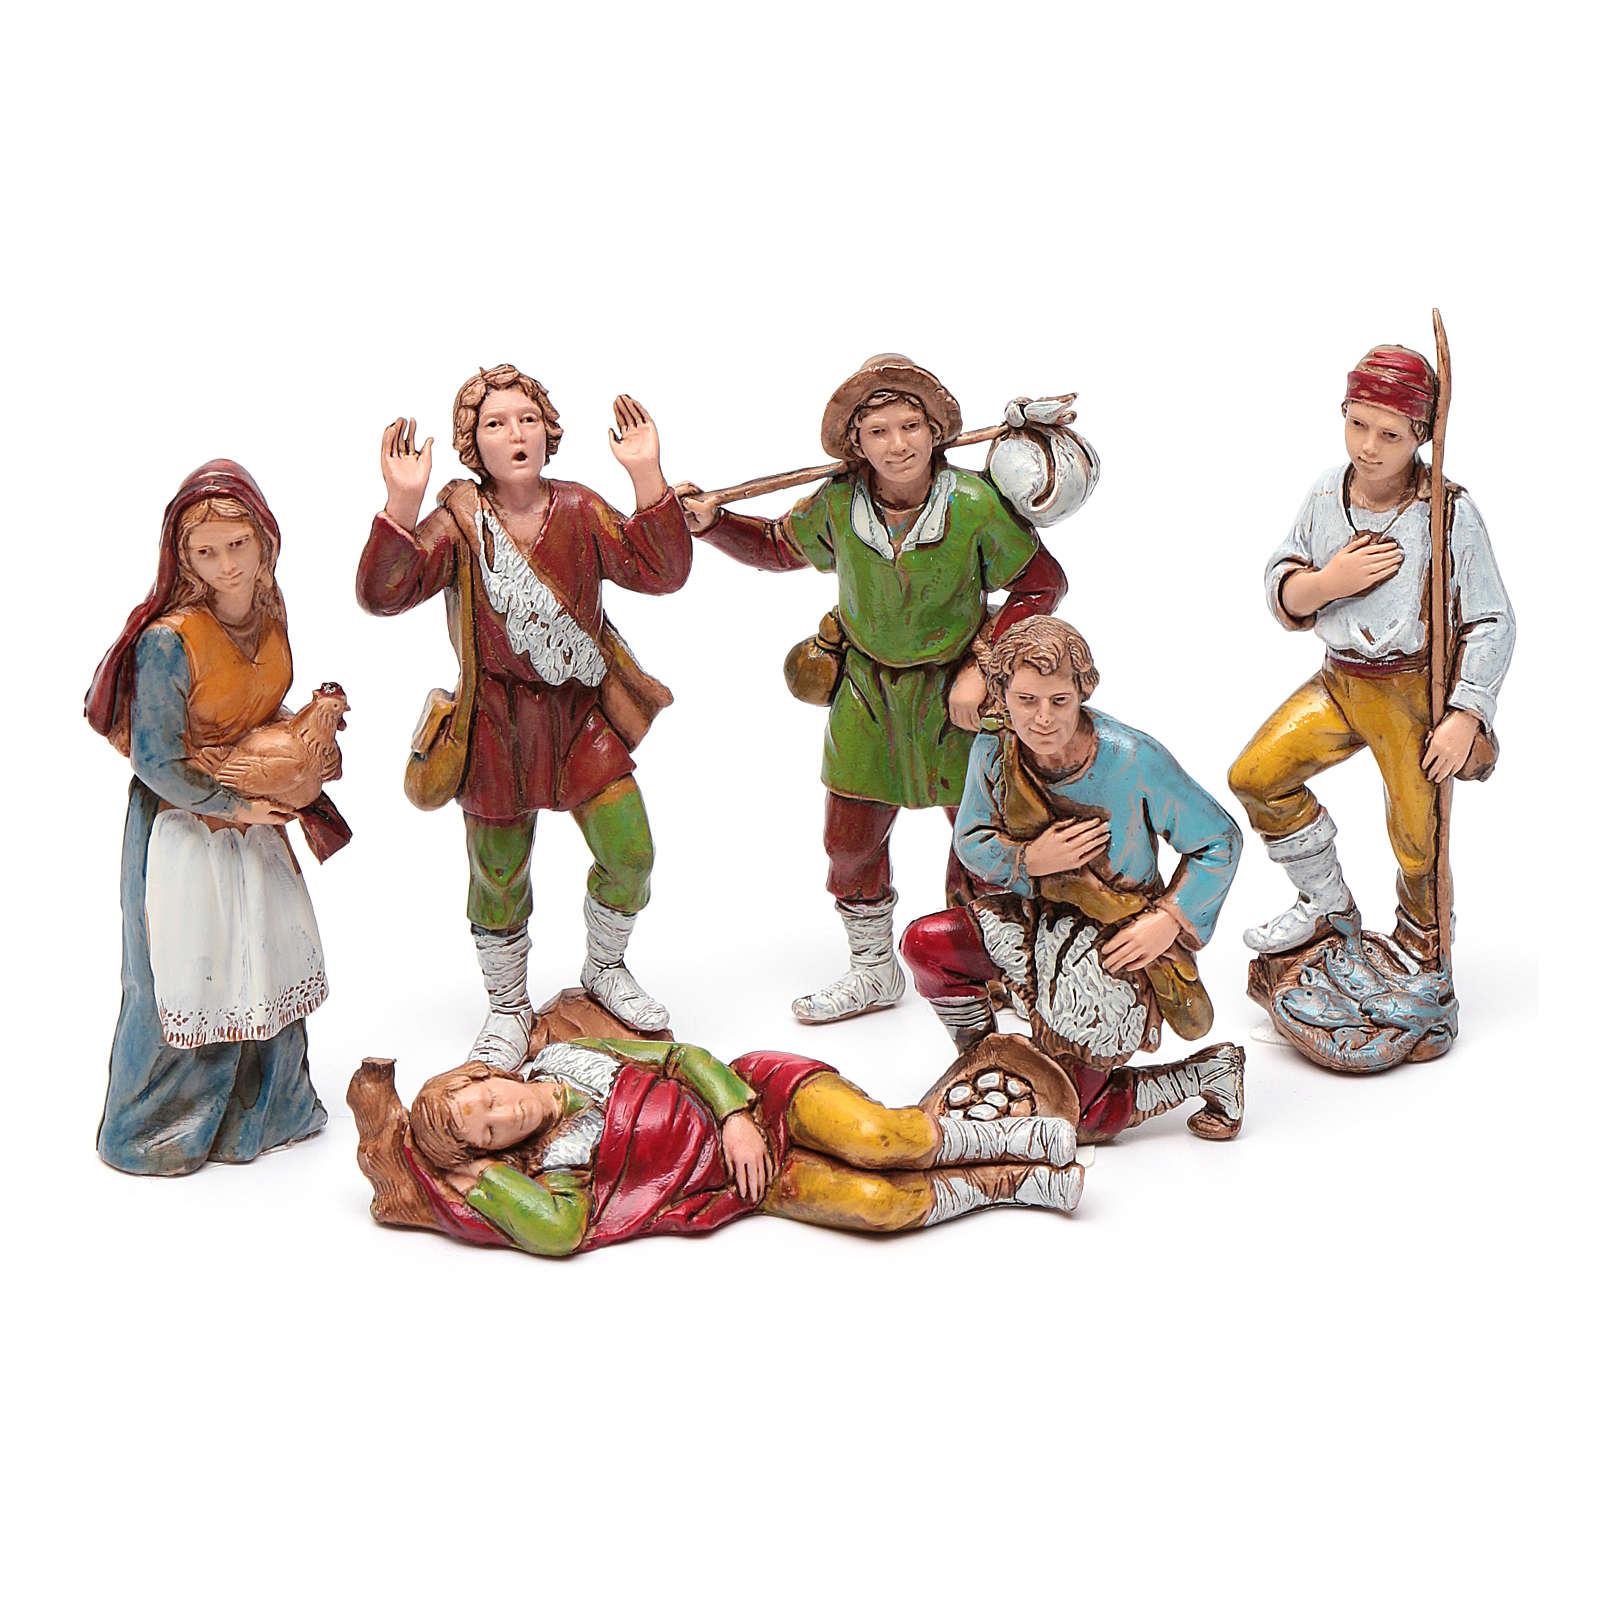 Grupo de pastores 8 cm Moranduzzo 6 figuras 4